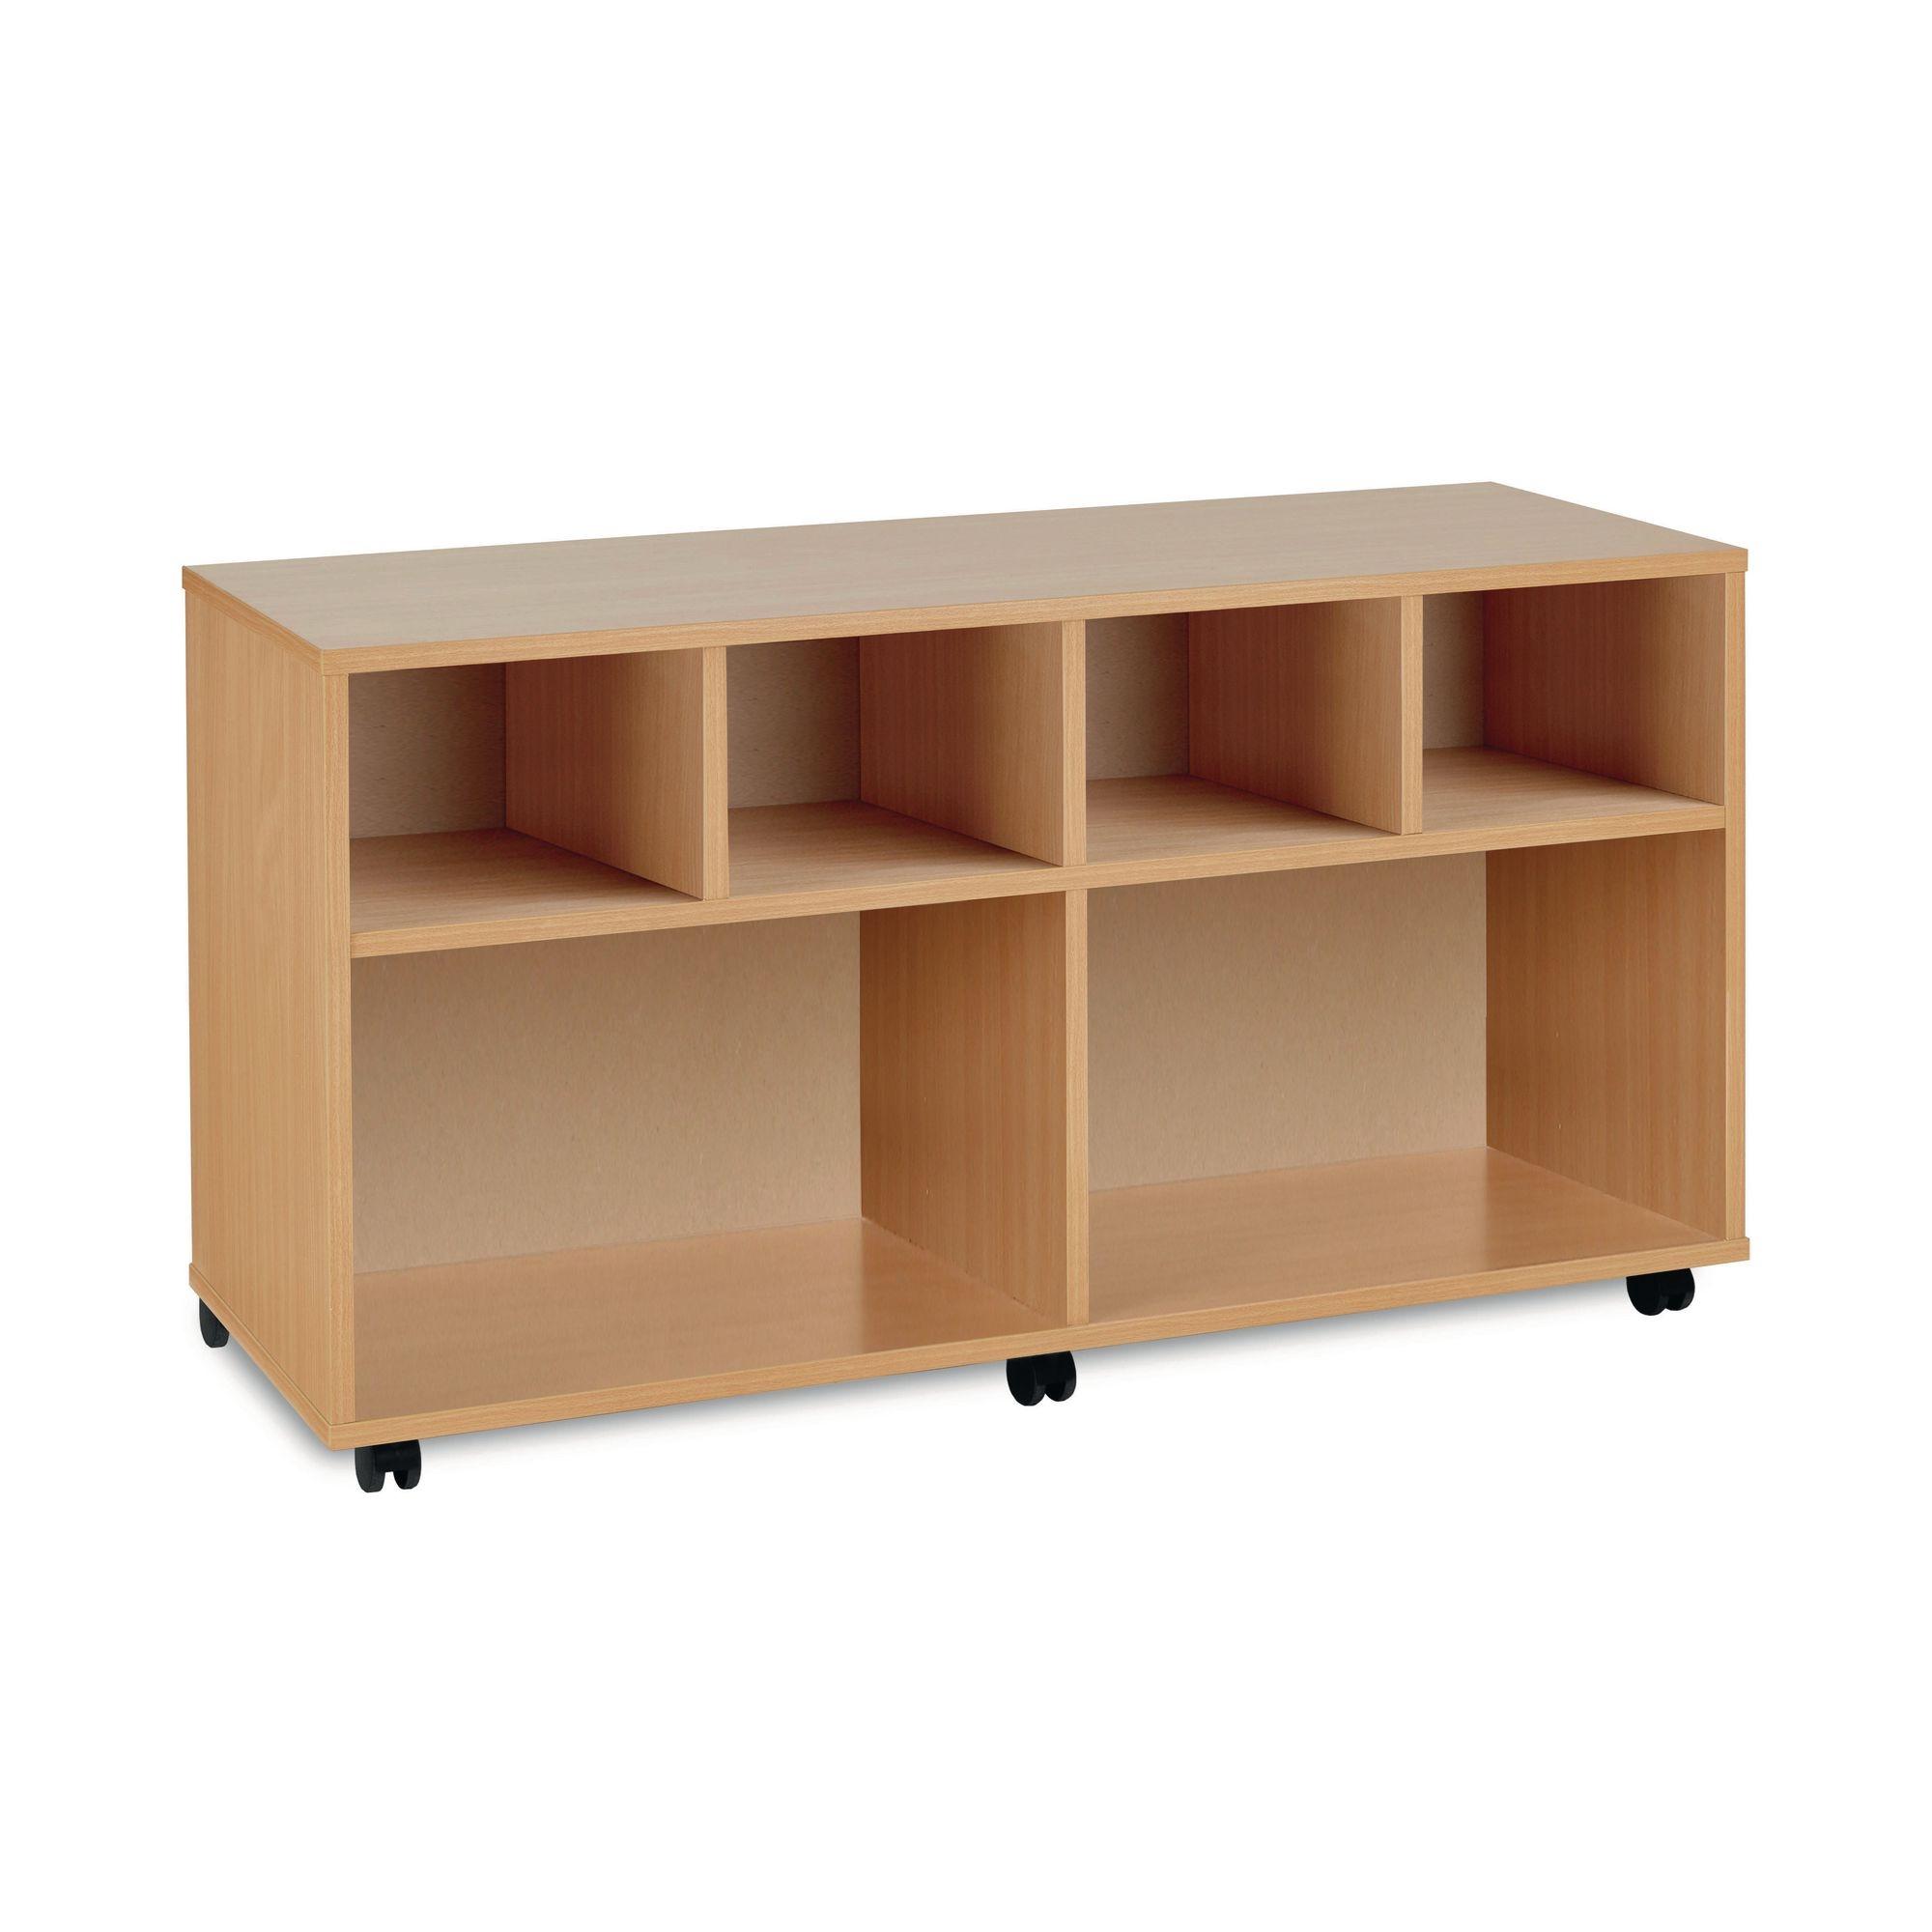 Rub Combi Unit 4x4l 2x9l 2x35l Exc Boxes